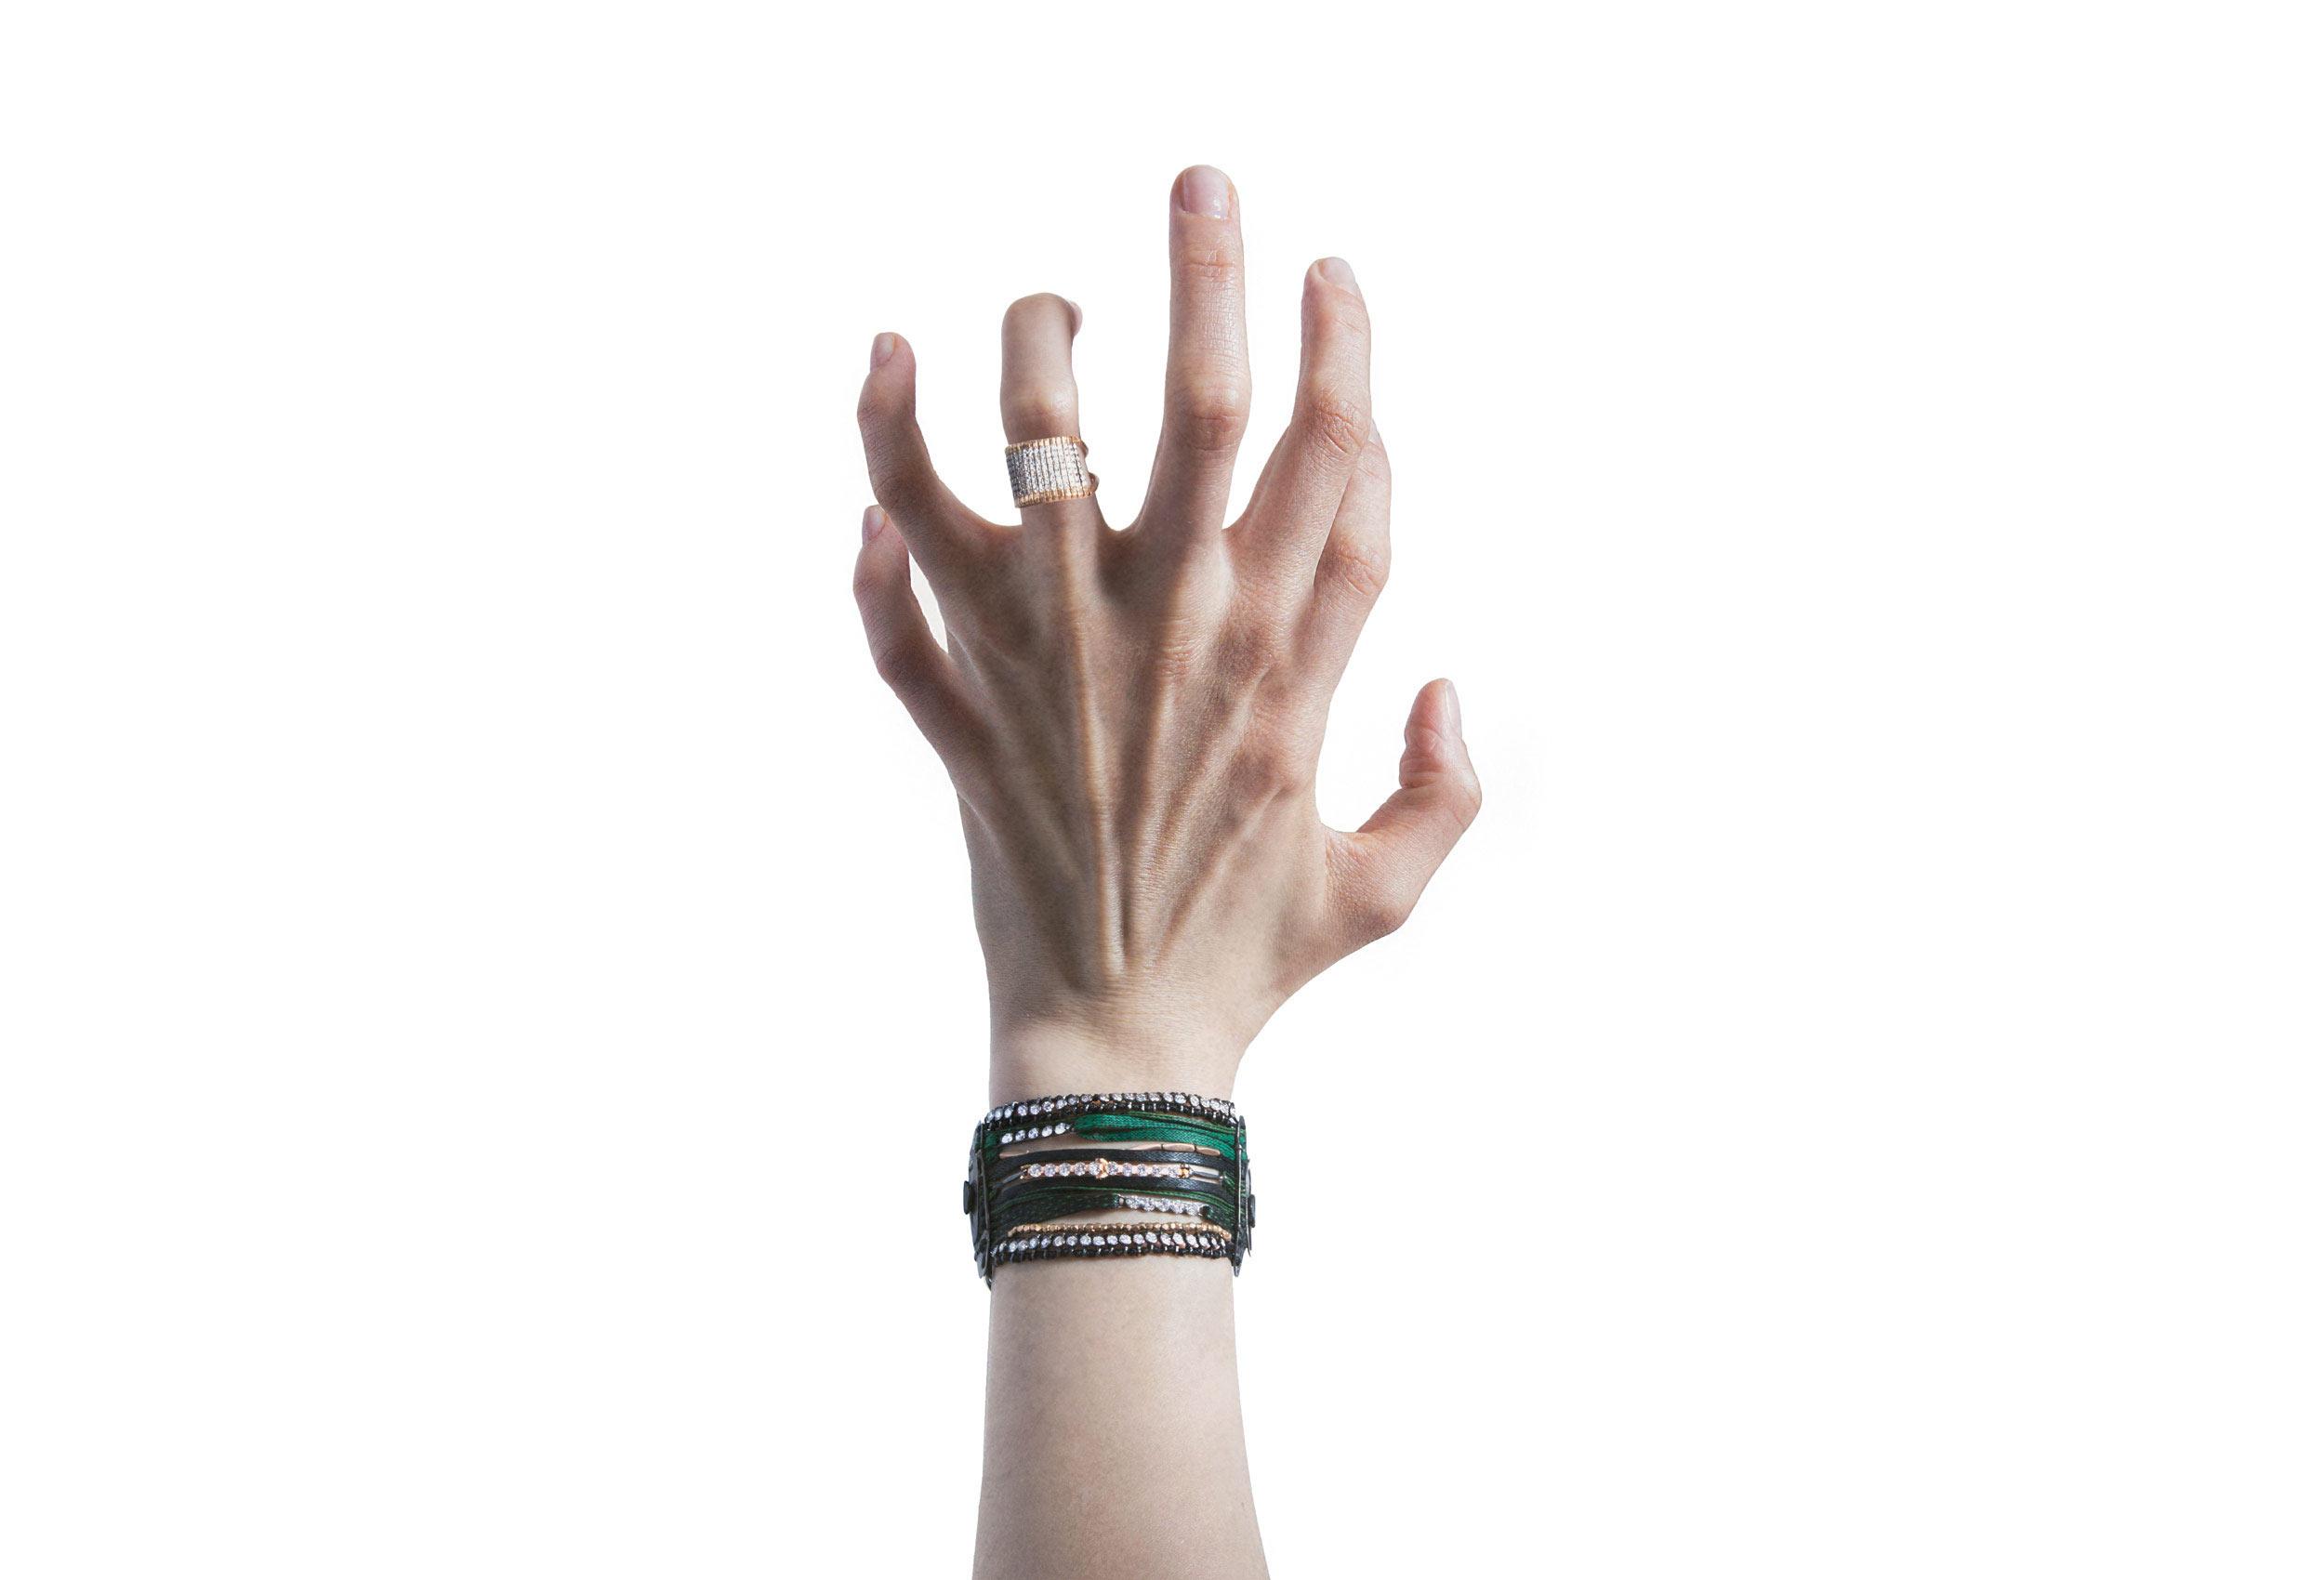 Apriati Contemporary Handmade Jewellery, SHOP THE LOOK